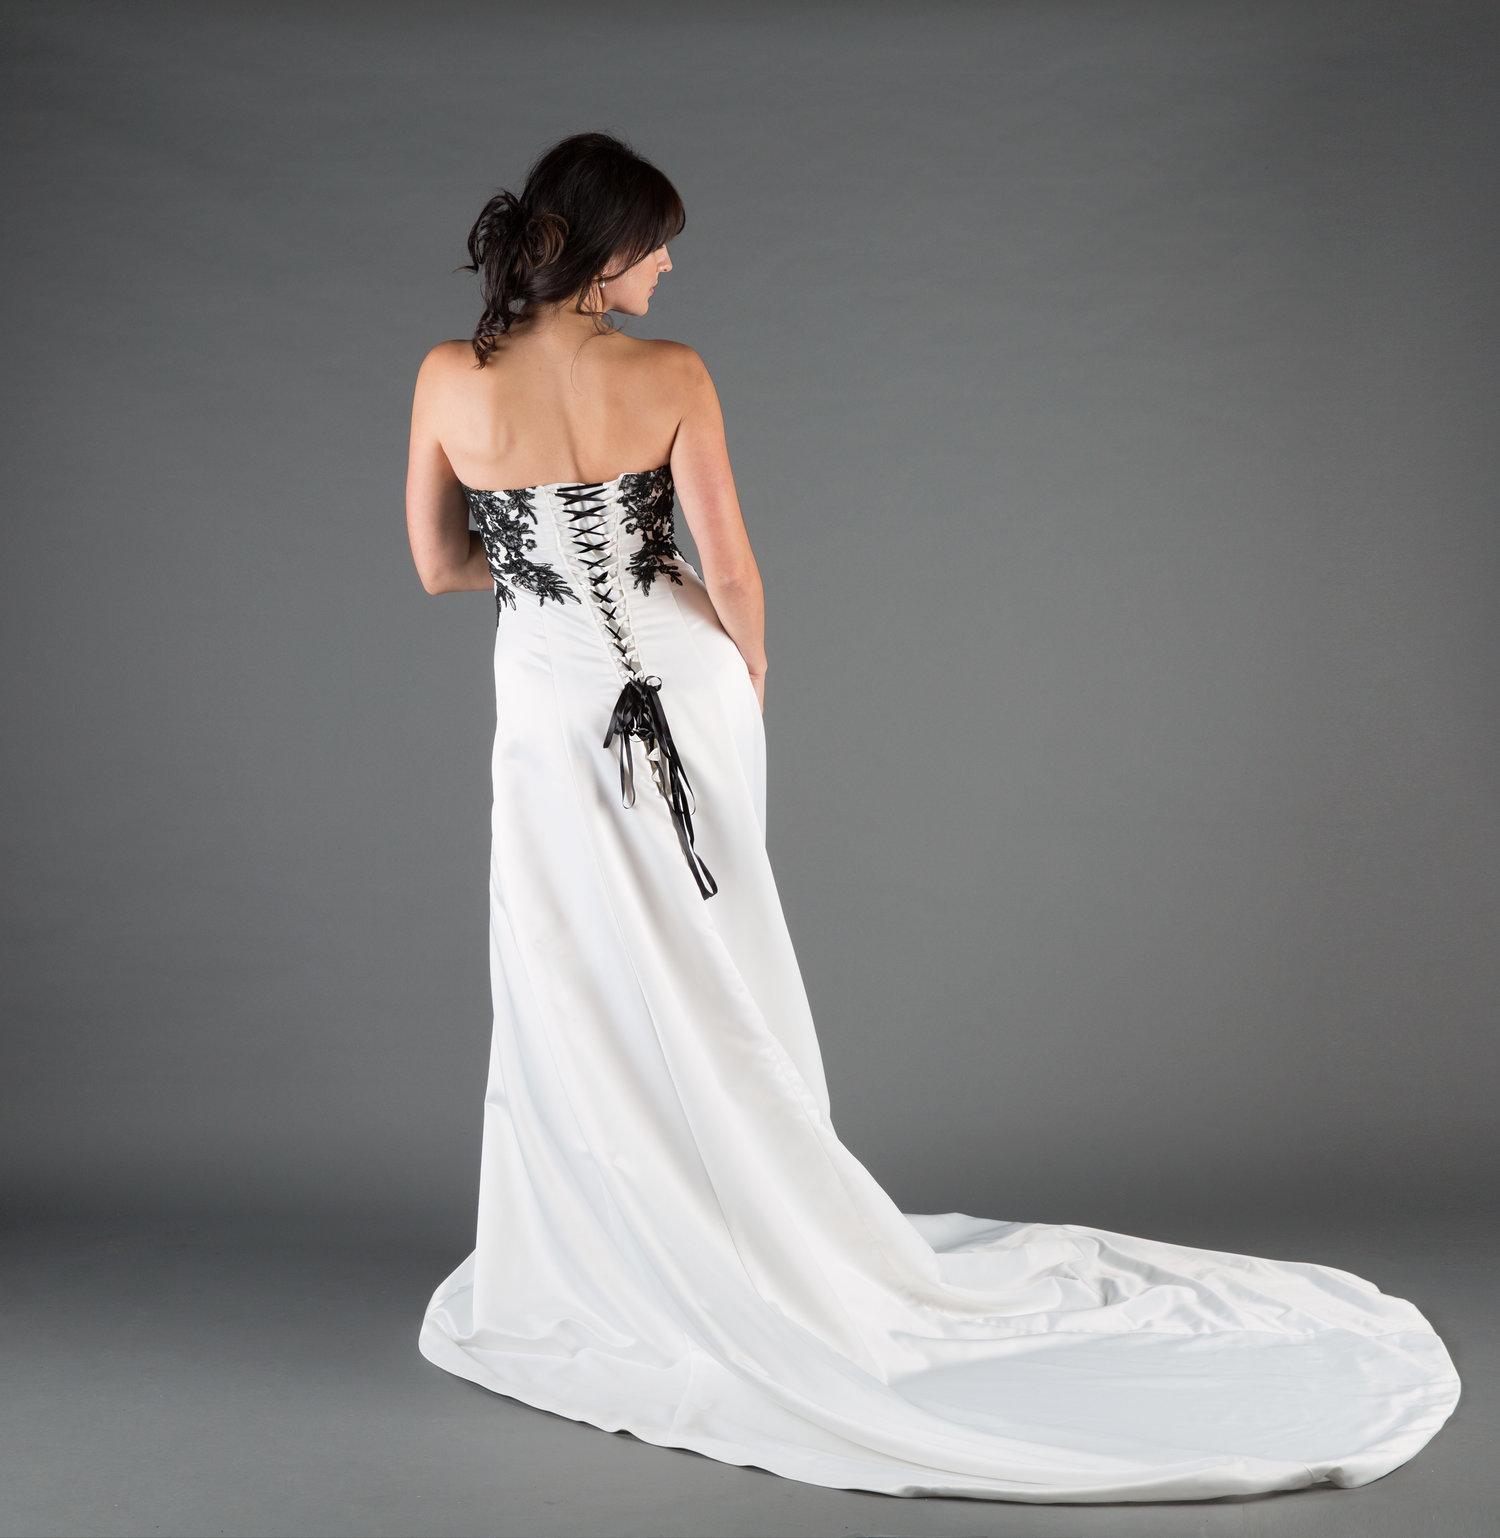 Duchess Ivory Black Wedding Dress Ivory Black